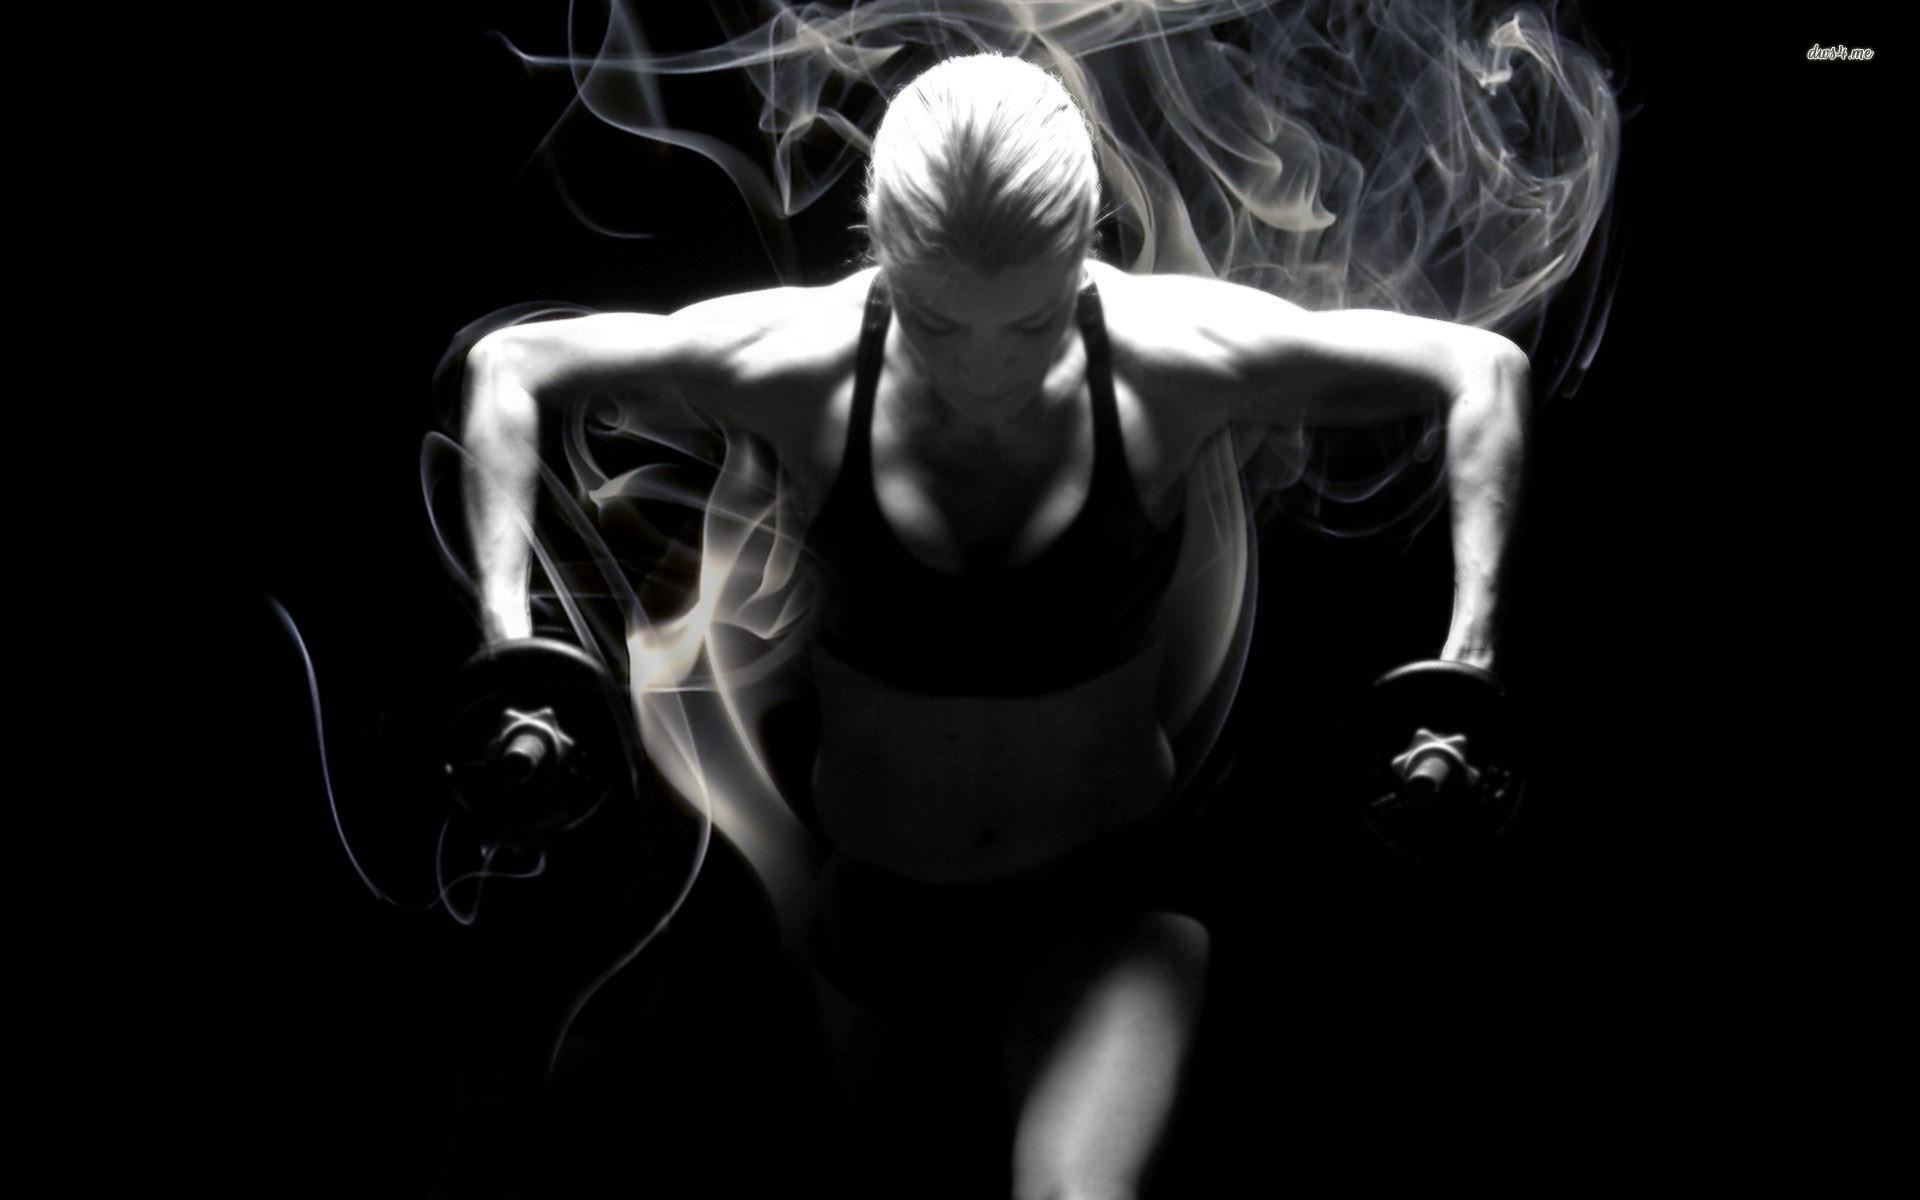 <b>Fitness Motivational Wallpaper</b> – WallpaperSafari